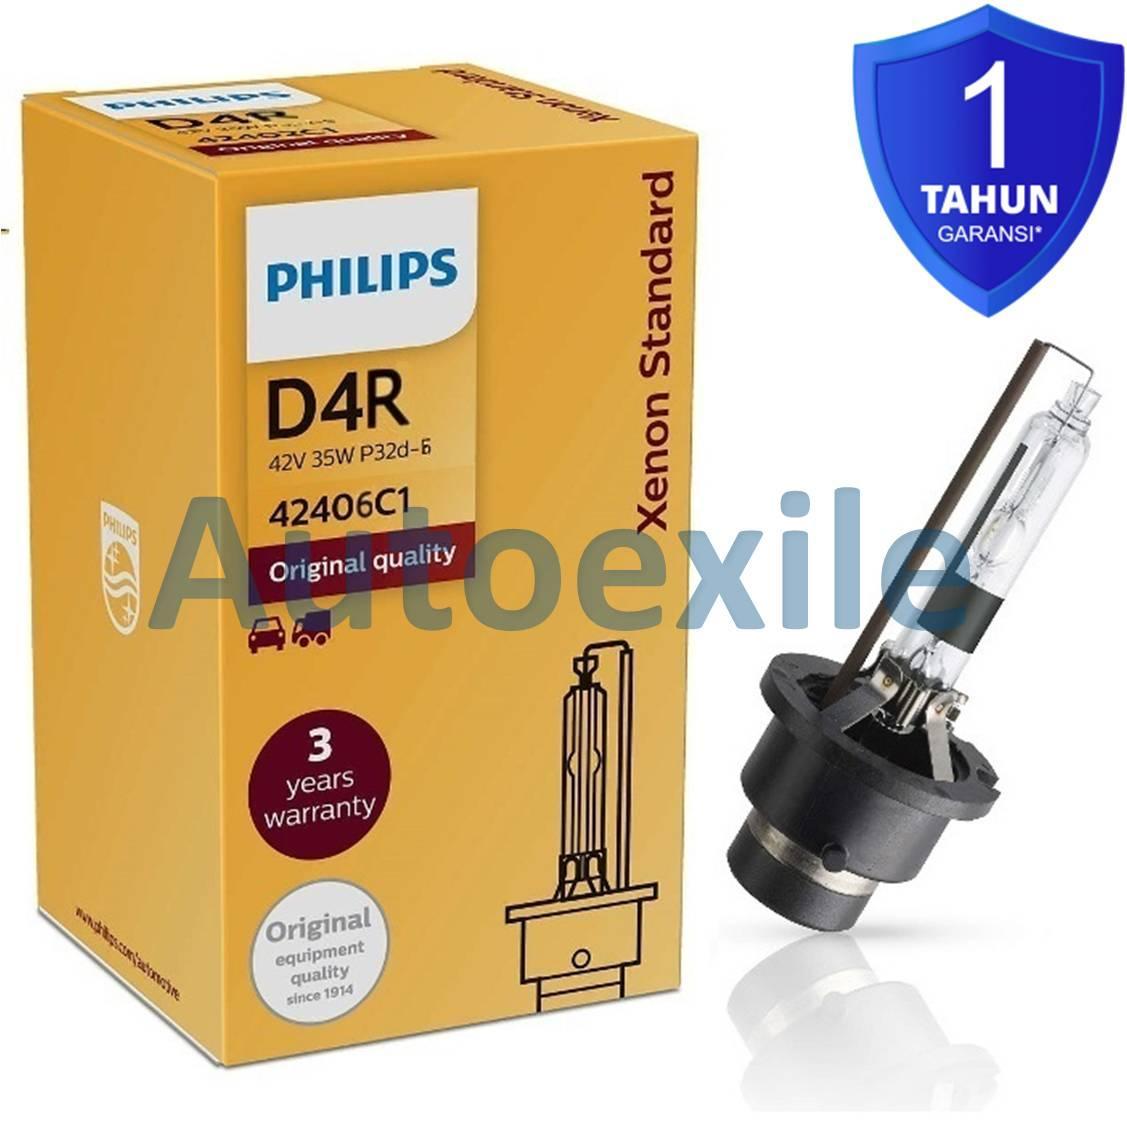 Philips Xenon Standard HID D4R 42V 35W 4200K Kuning Terang Garansi Original Lampu Depan Mobil New Vios New Altis Mark-X FT-86